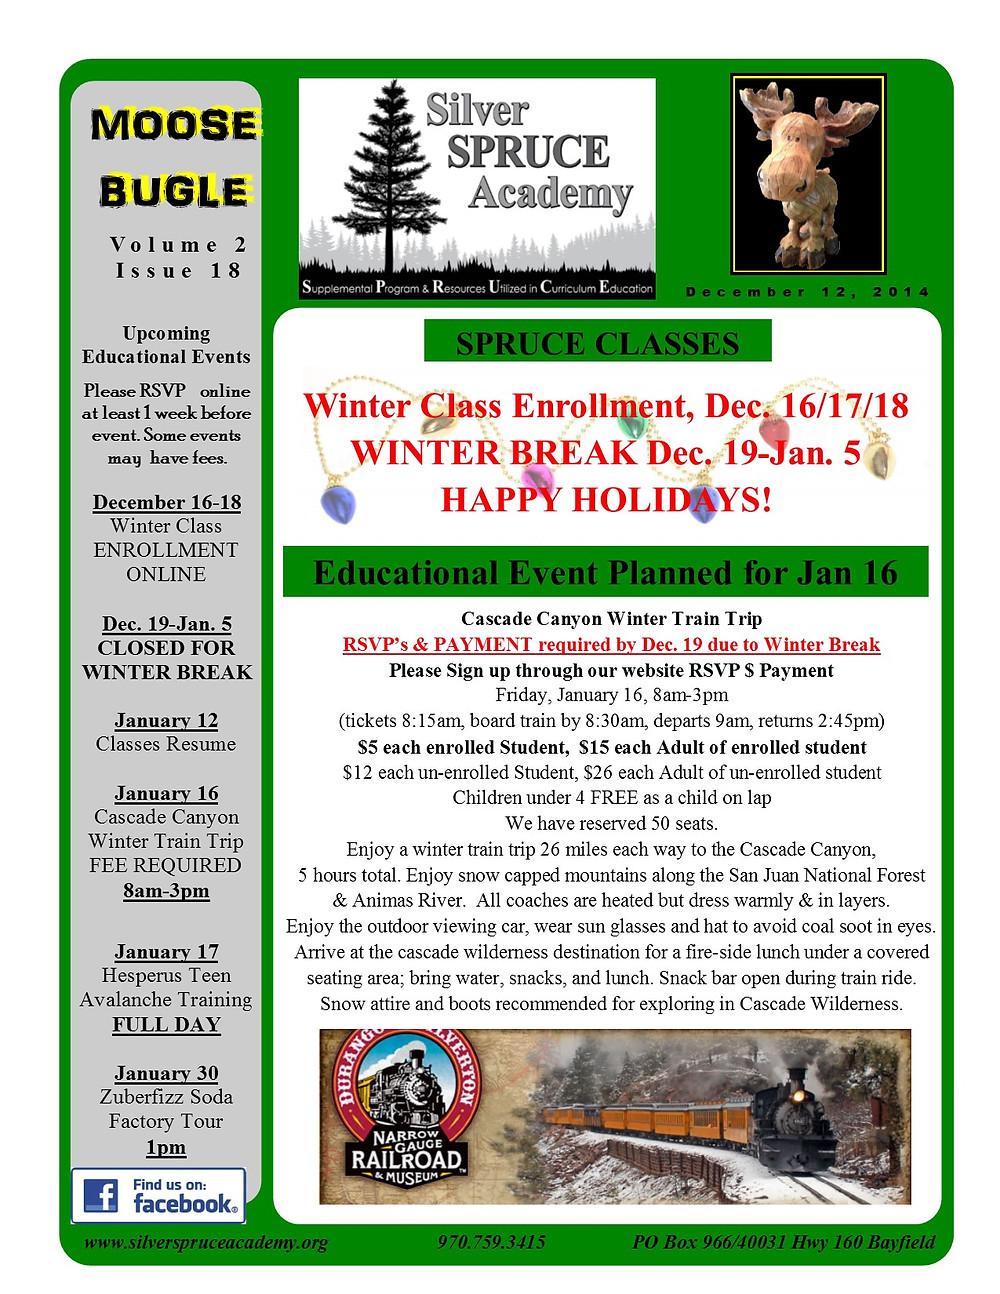 Moose Bugle 12-12-14 Page 1.jpg